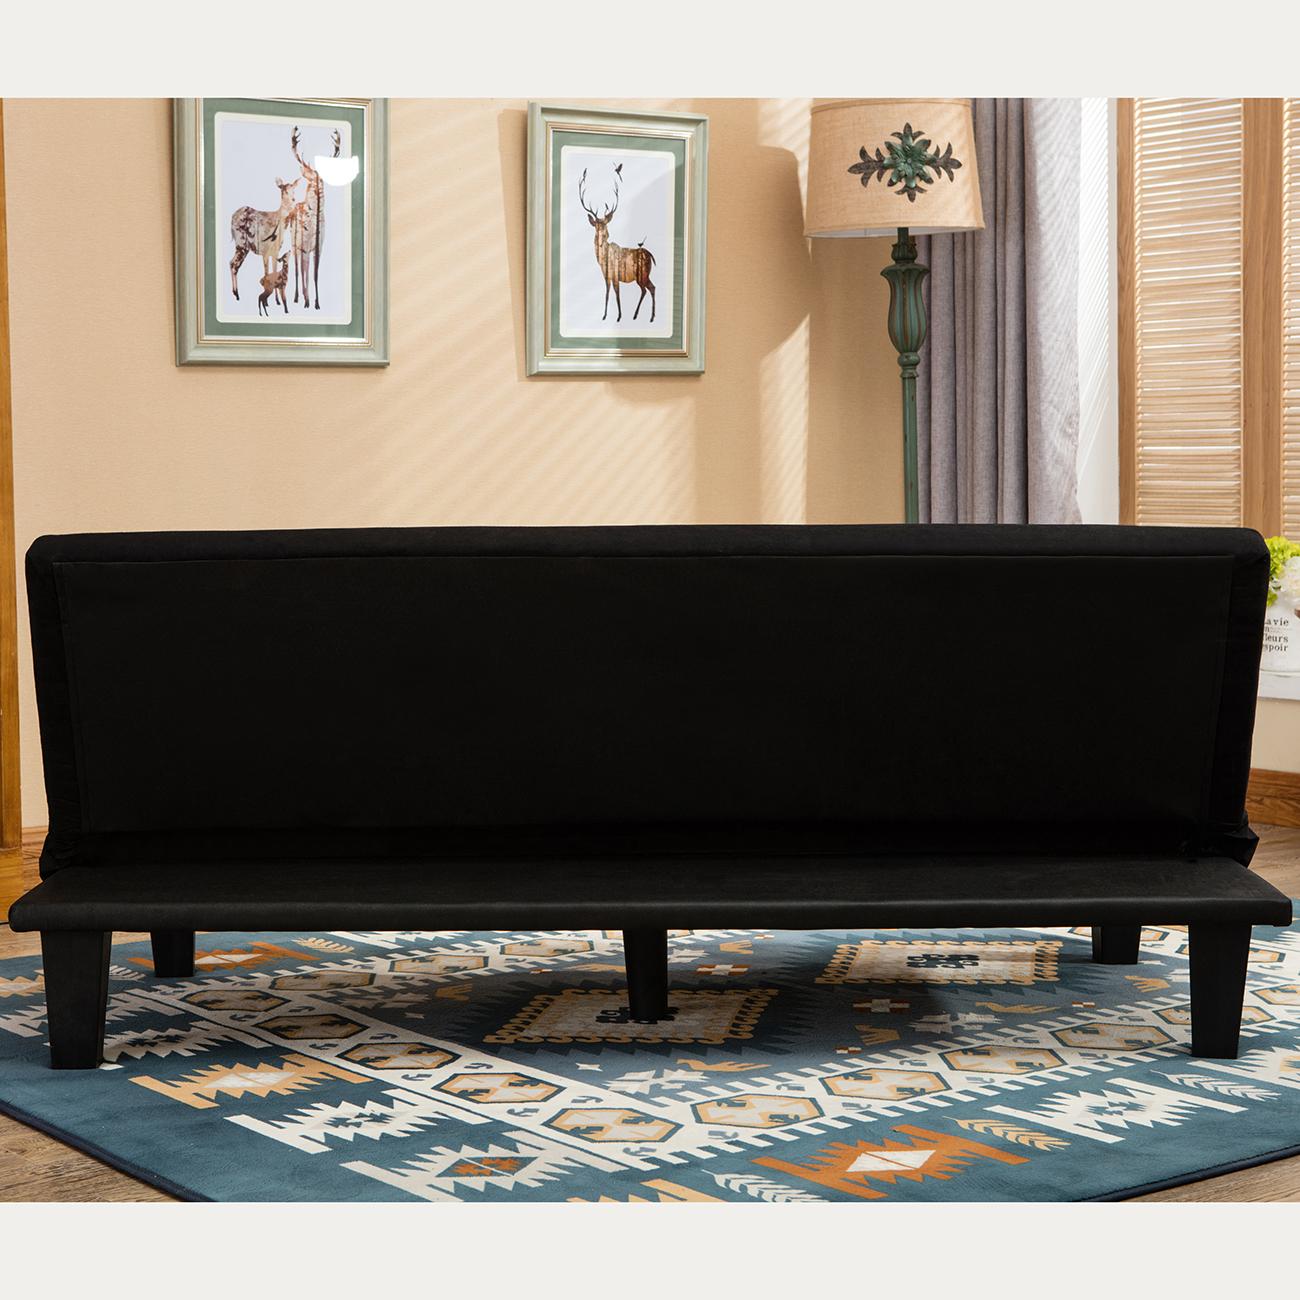 Modern Style Sofa modern style sofa bed futon couch sleeper lounge sleep dorm office